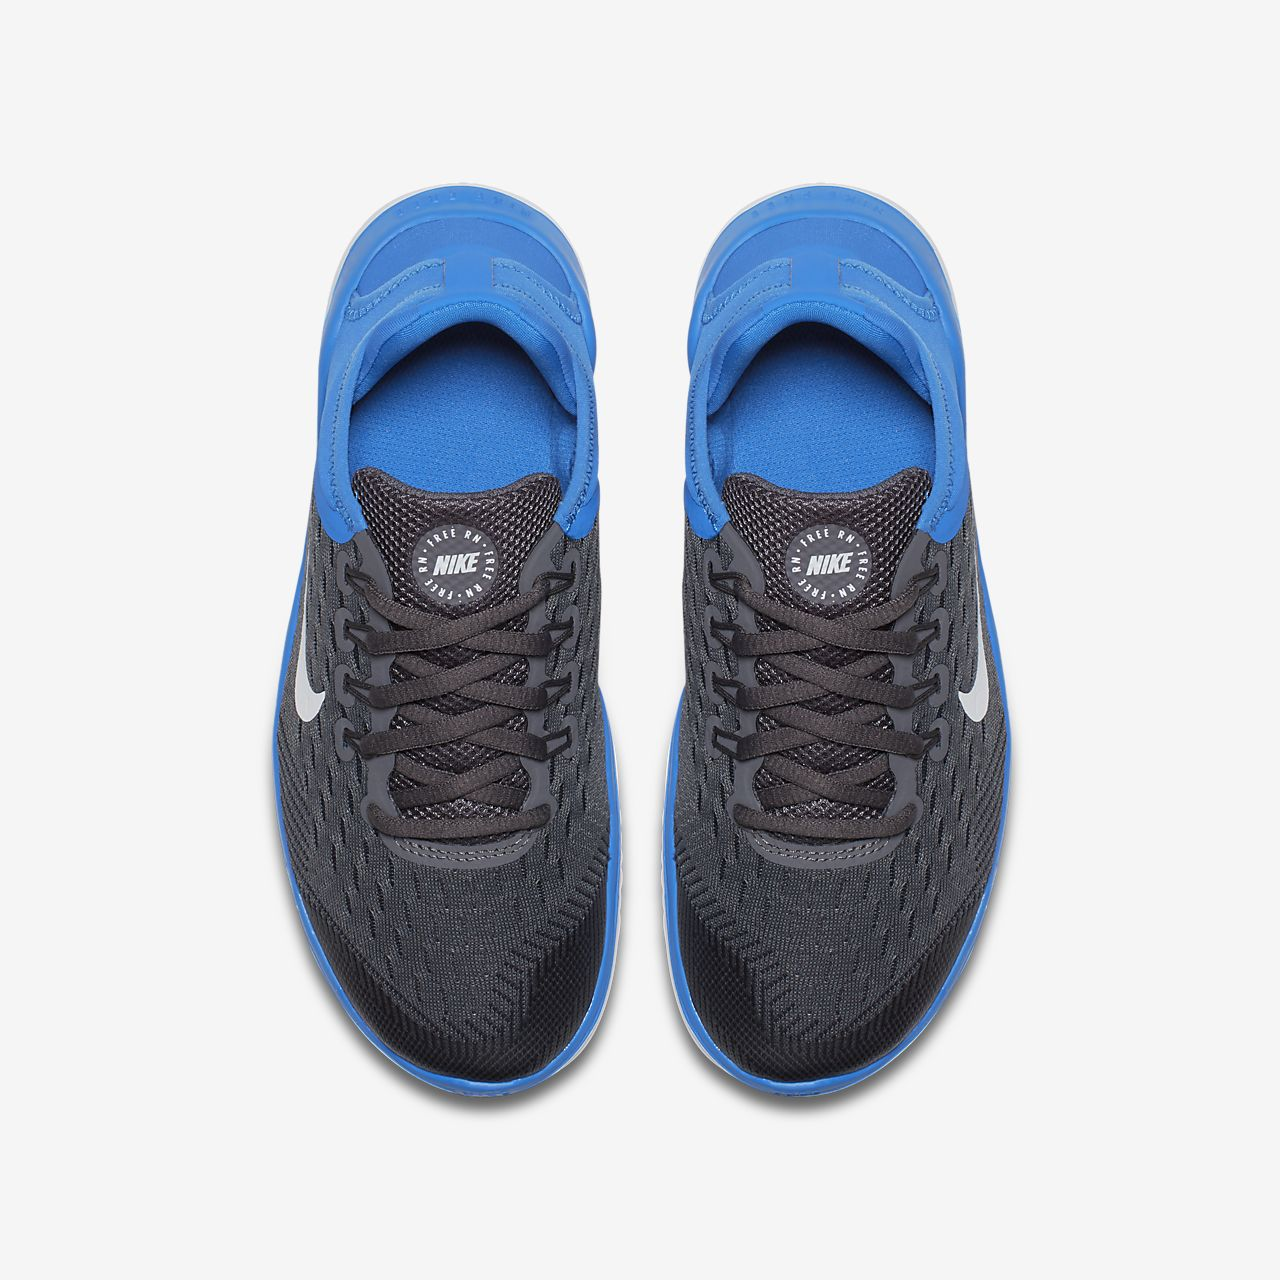 Nike Free Rn 2018 Gunsmoke Laufschuhe Für Damen | Online